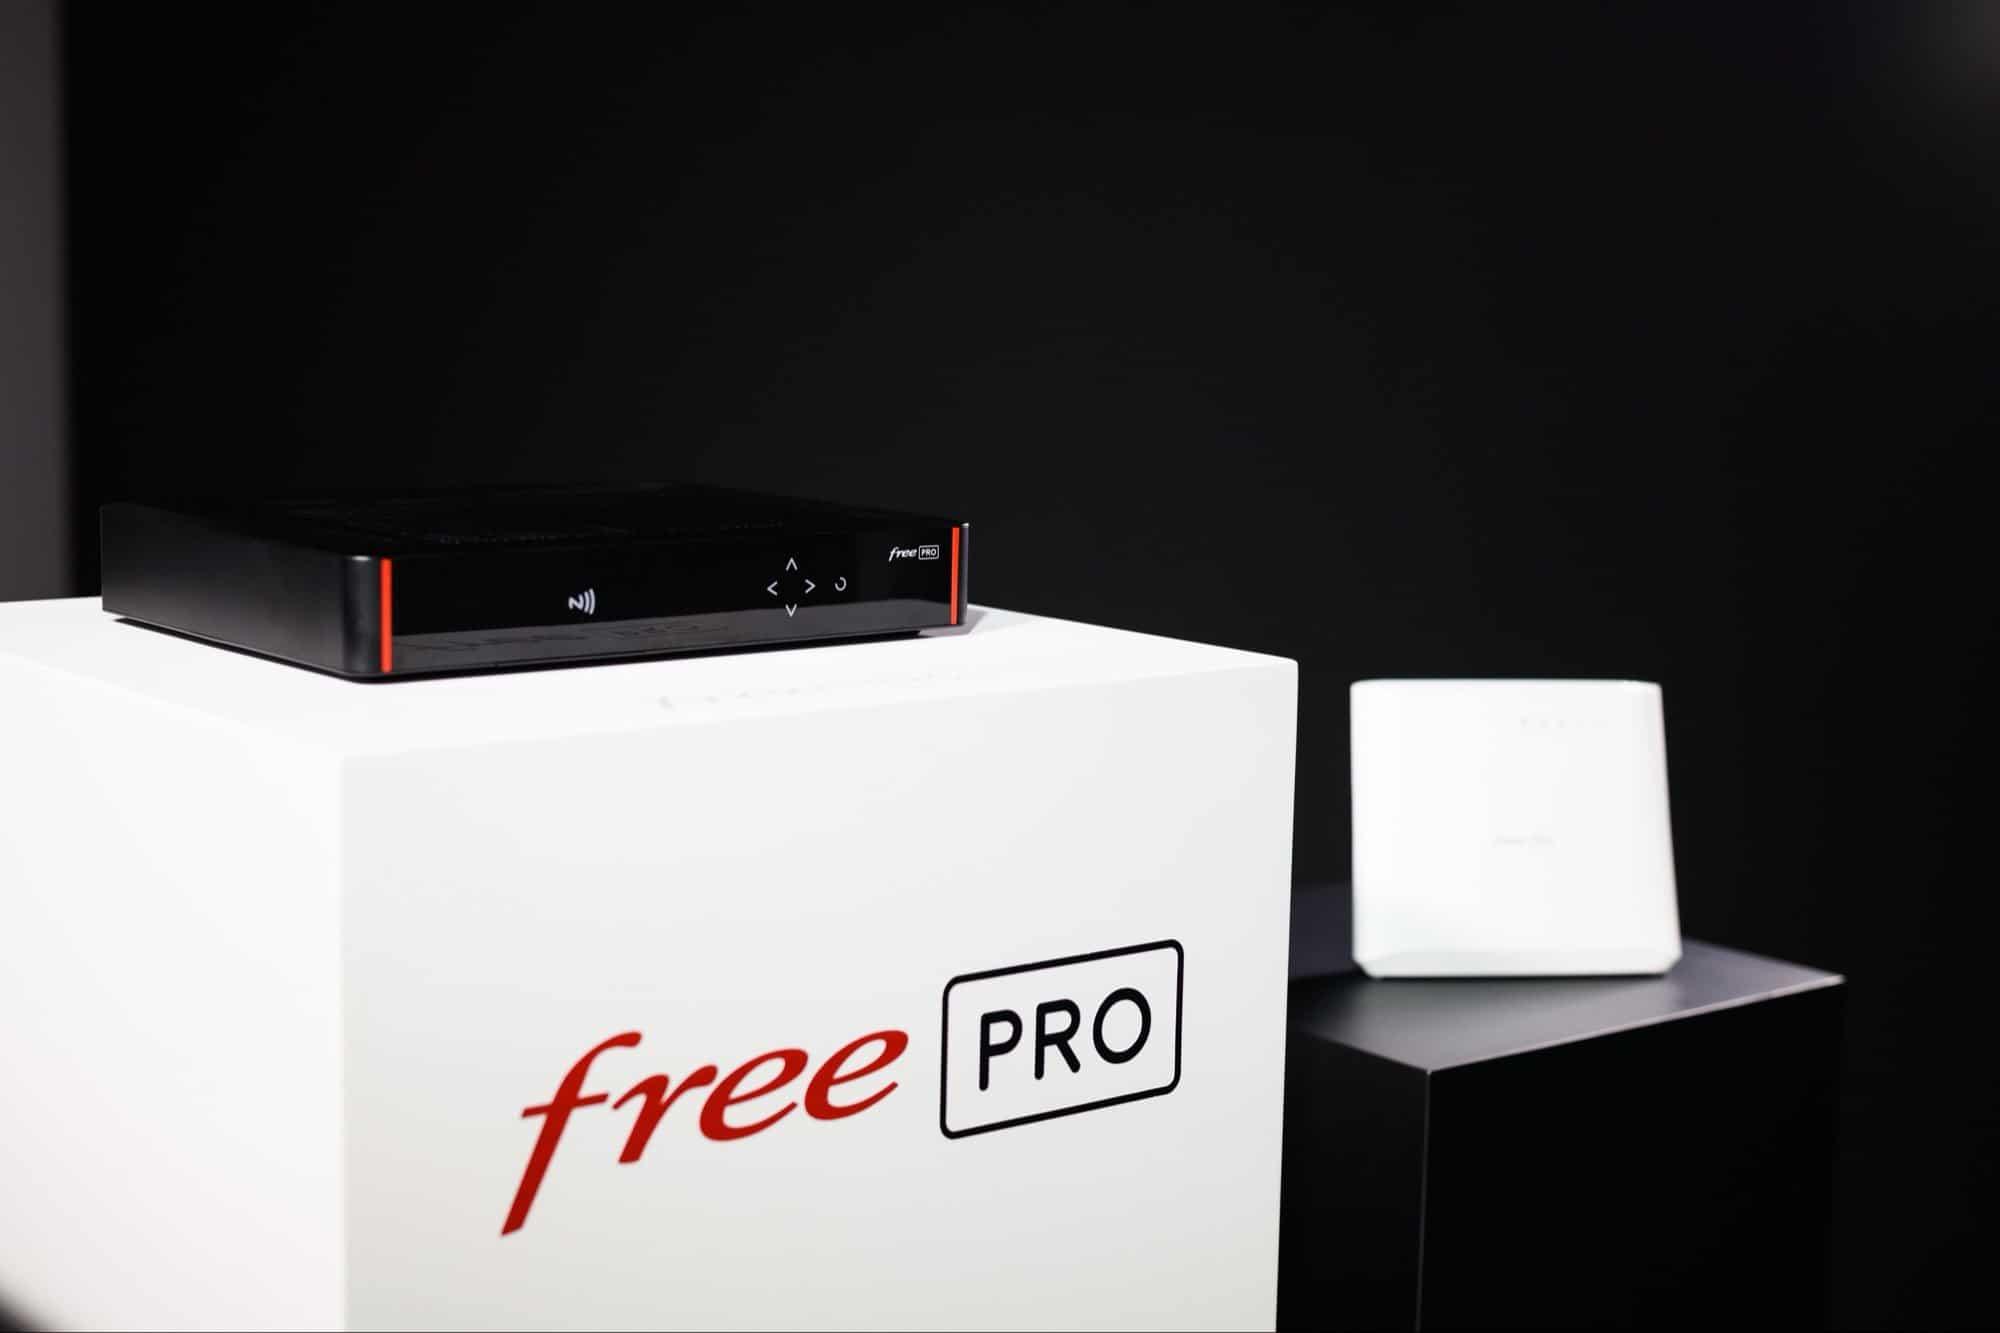 Free pro avis